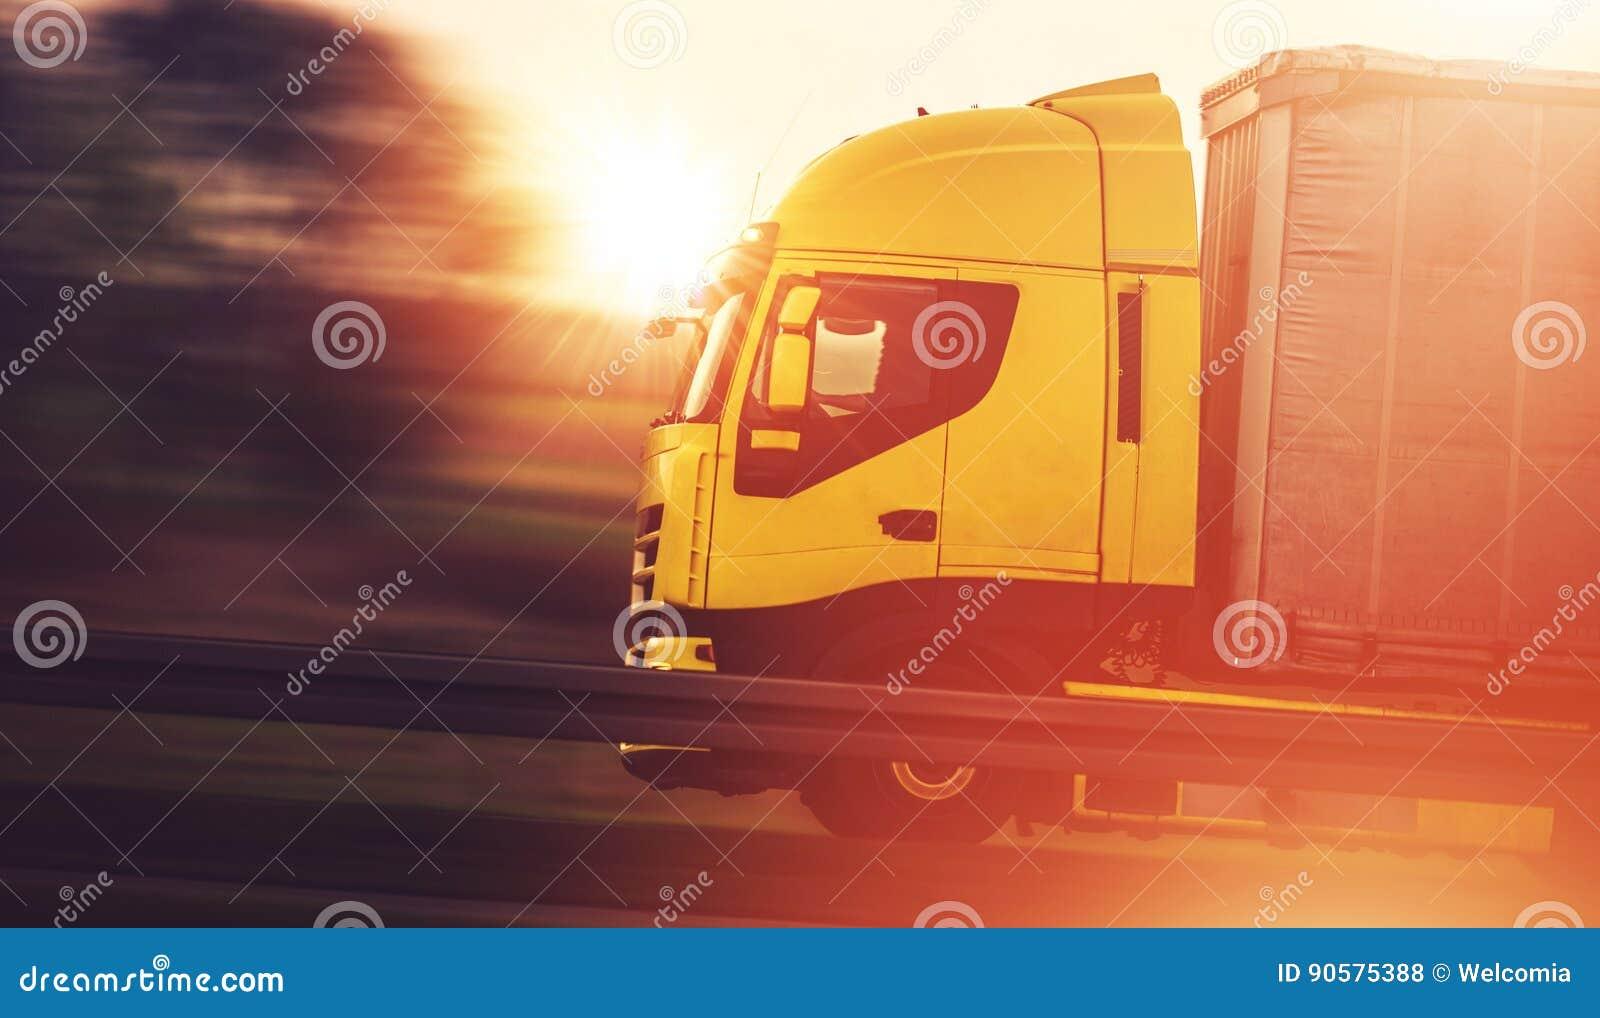 Shipment Transport by Truck